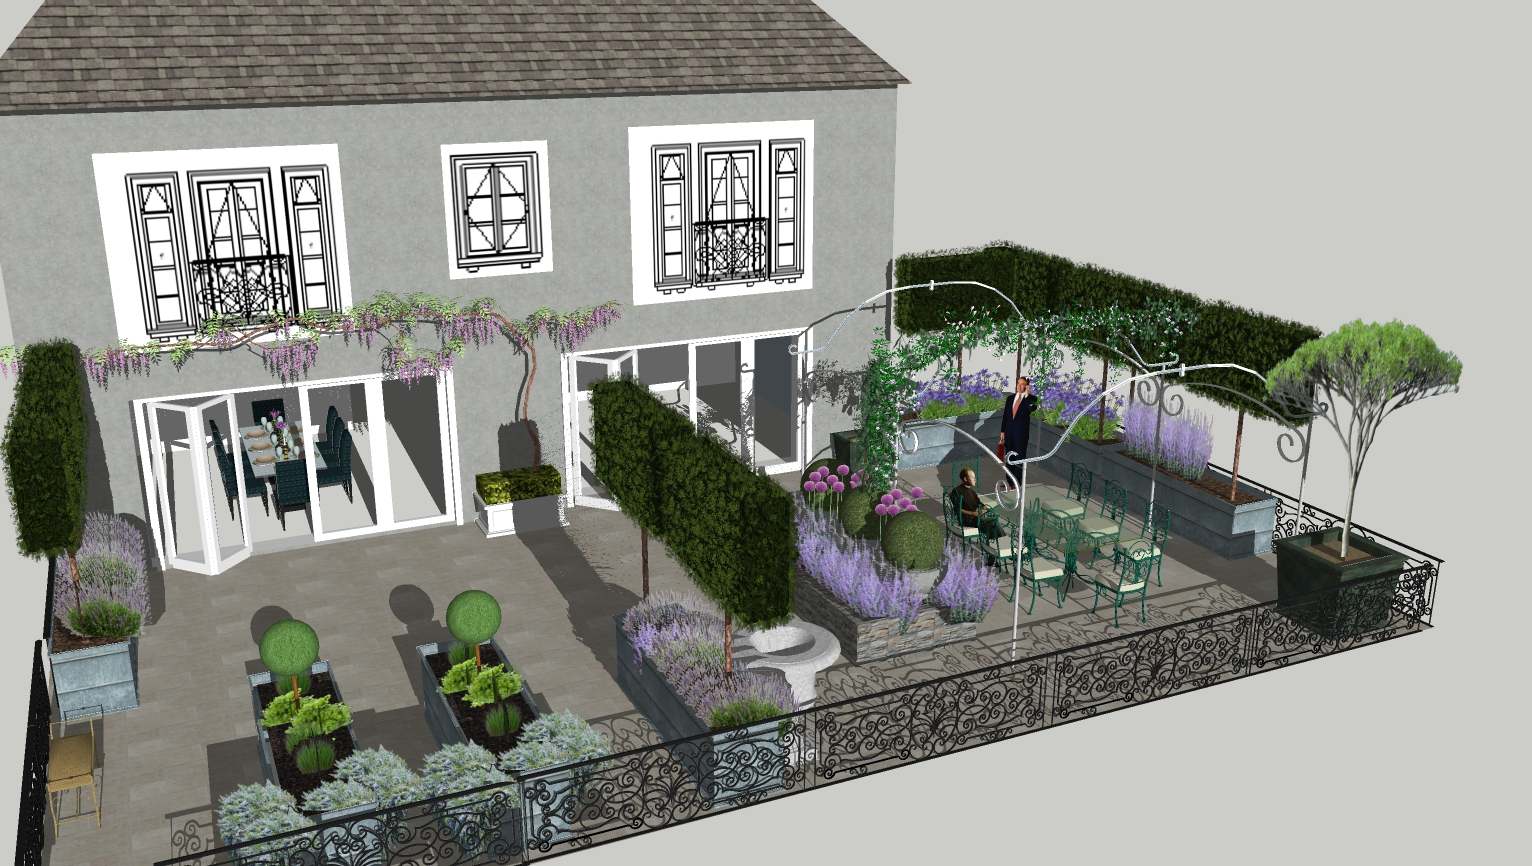 Dorset garden design